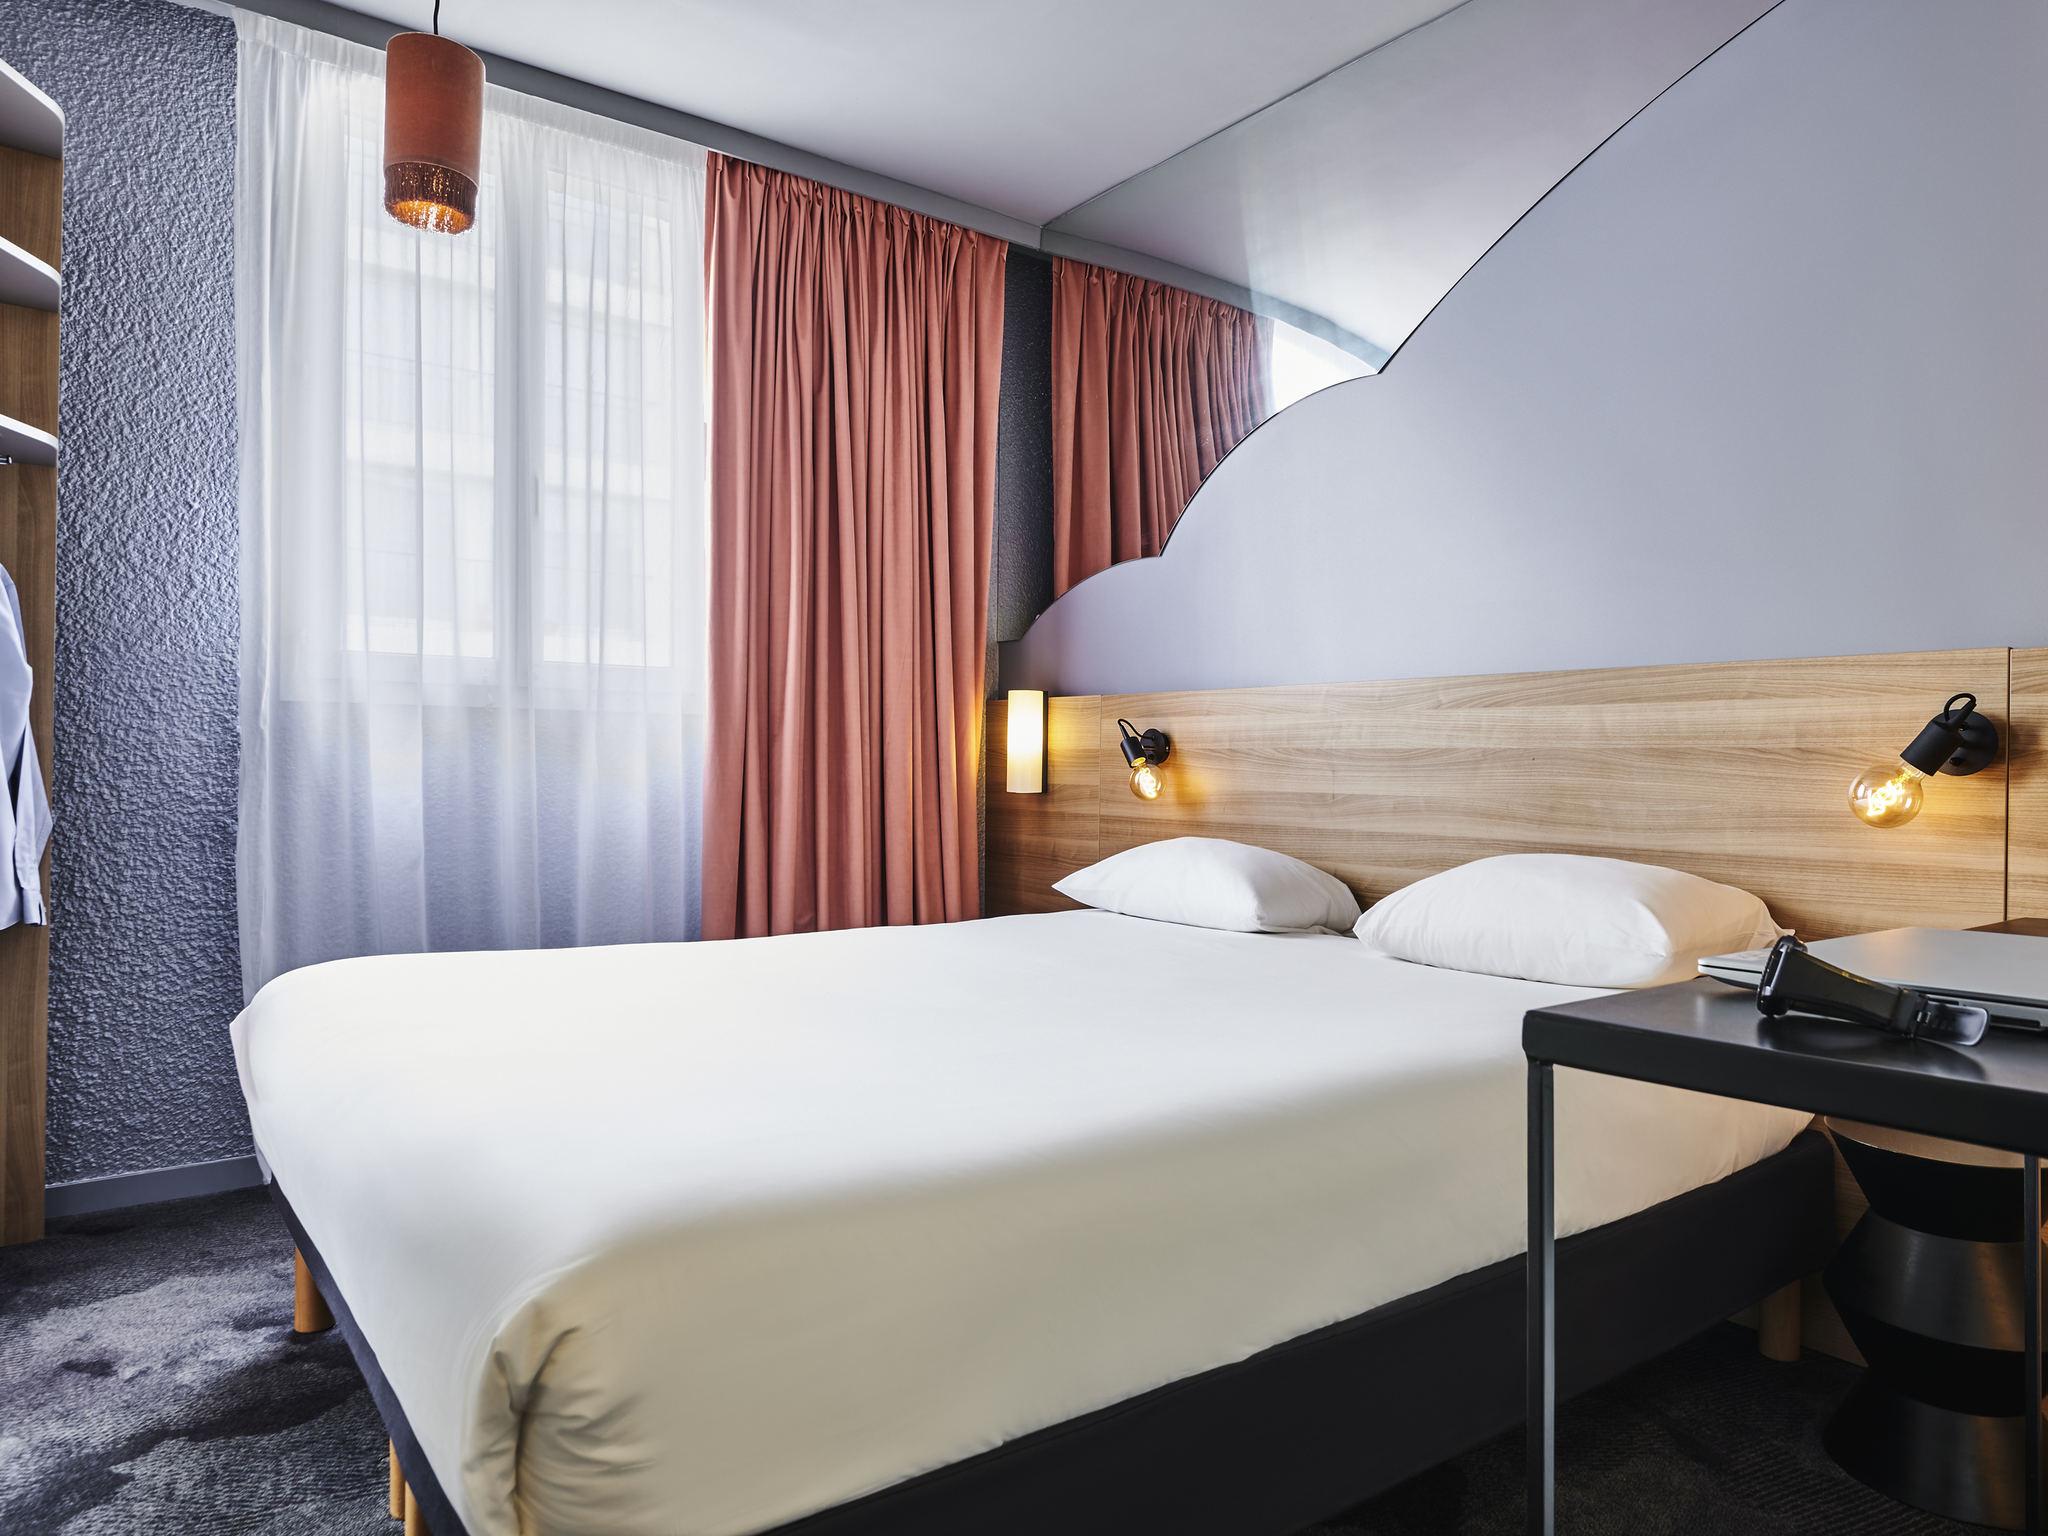 فندق - إيبيس ستايلز ibis Styles باريس أليزيا مونبارناس